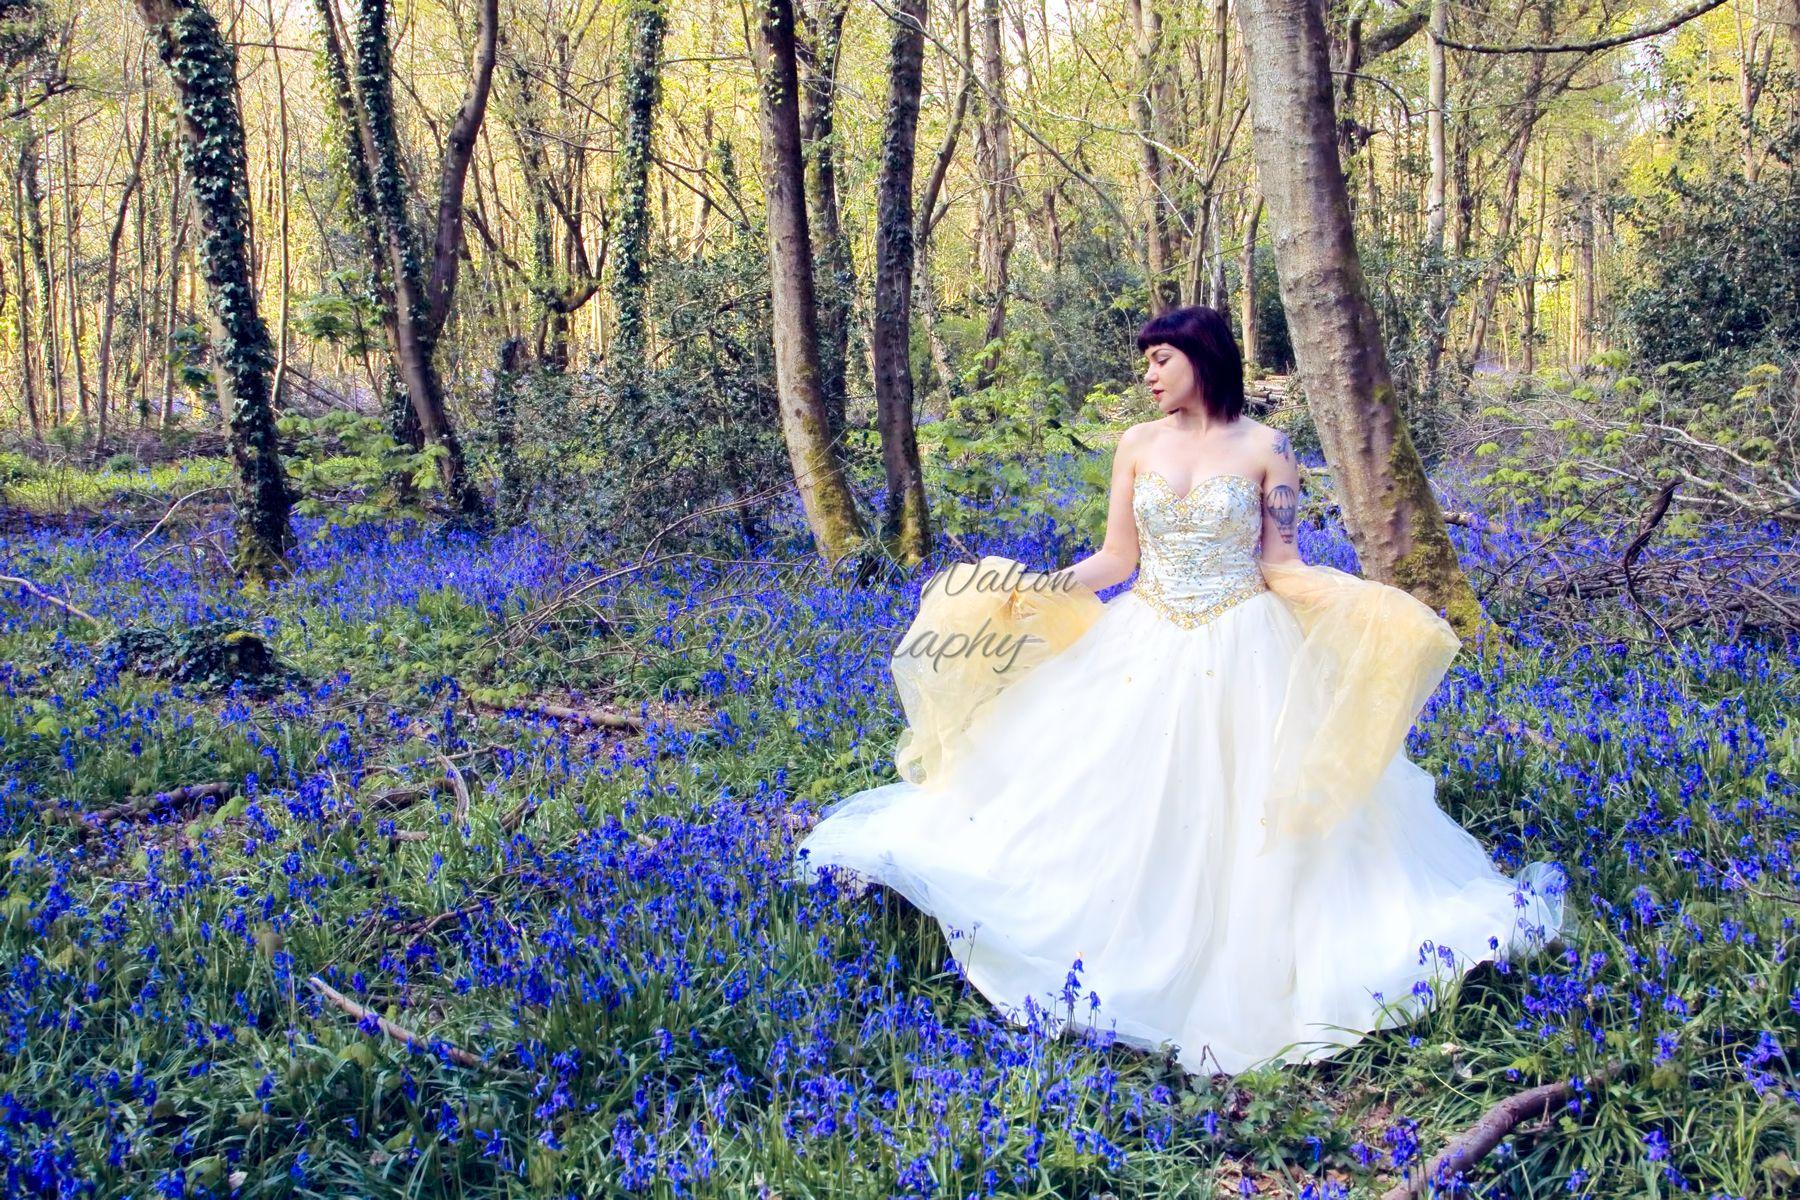 Wedding photography in a bluebell wood #weddingdress #bluebells #bluebellwoods #springbrides #weddingphotography #conceptphotography